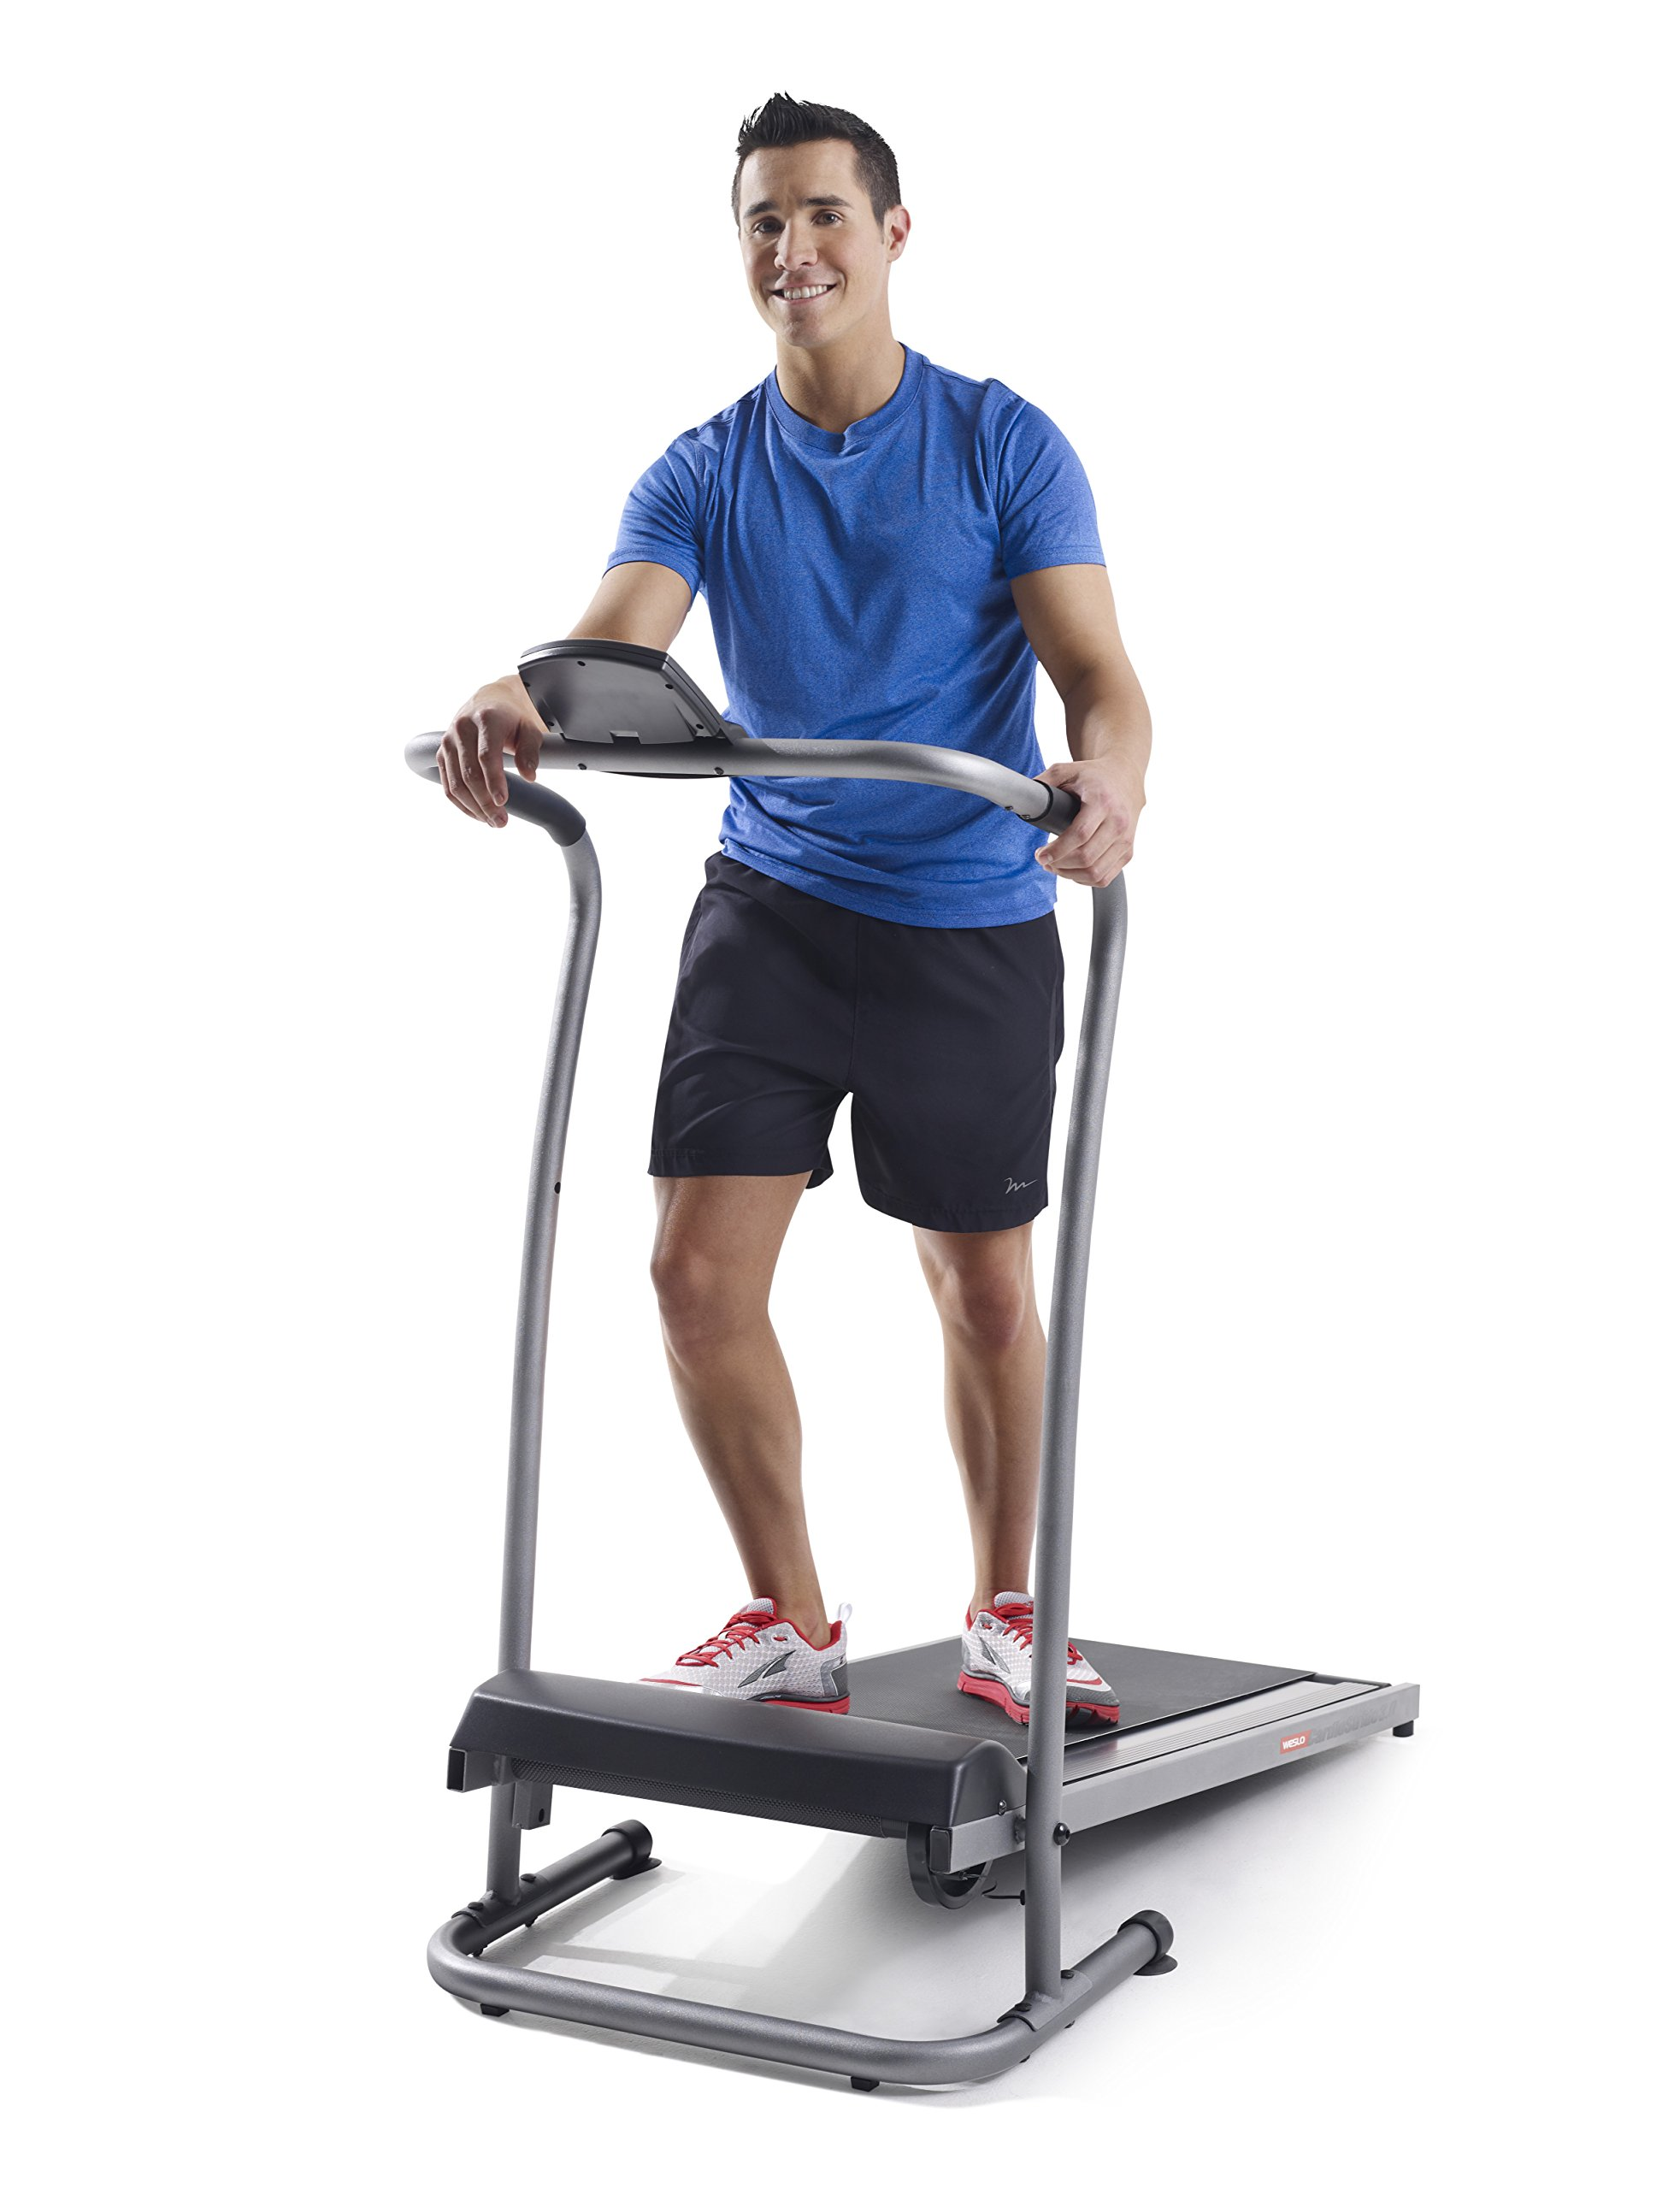 Weslo WLTL99315 CardioStride 3.0 Treadmill by Weslo (Image #9)